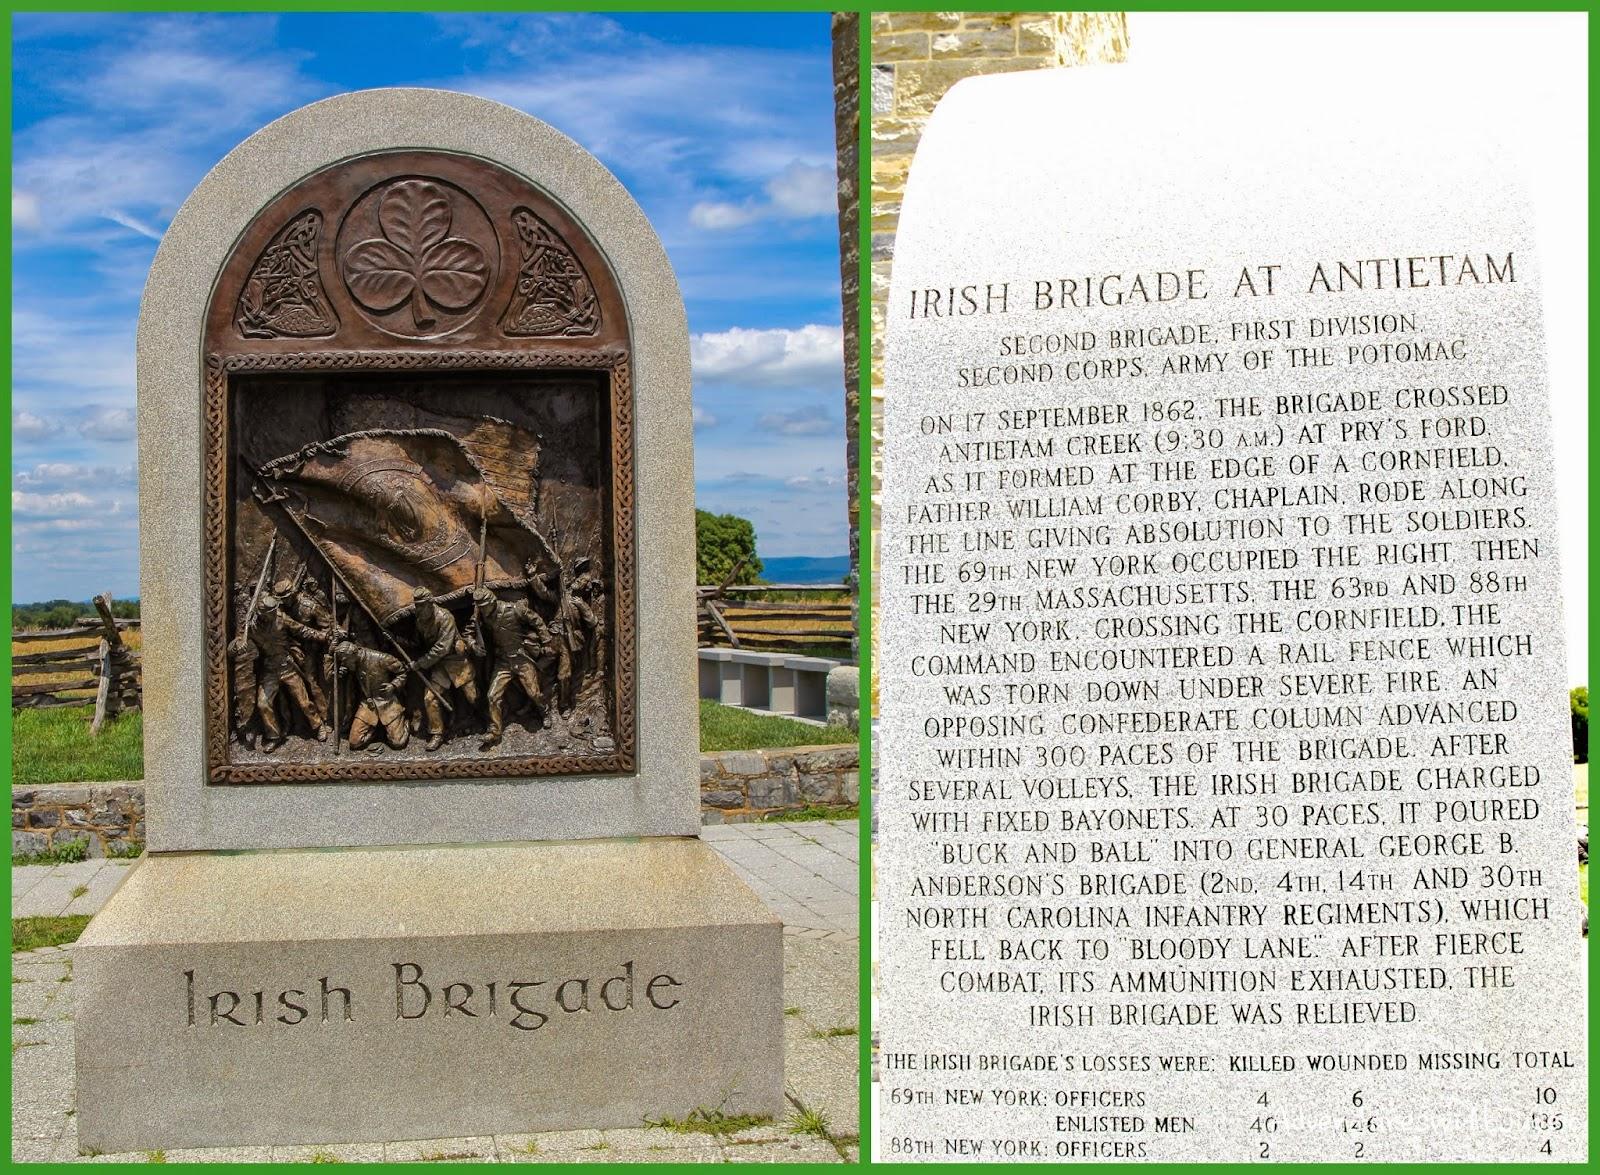 Irish Brigade Memorial at Antietam National Battlefield